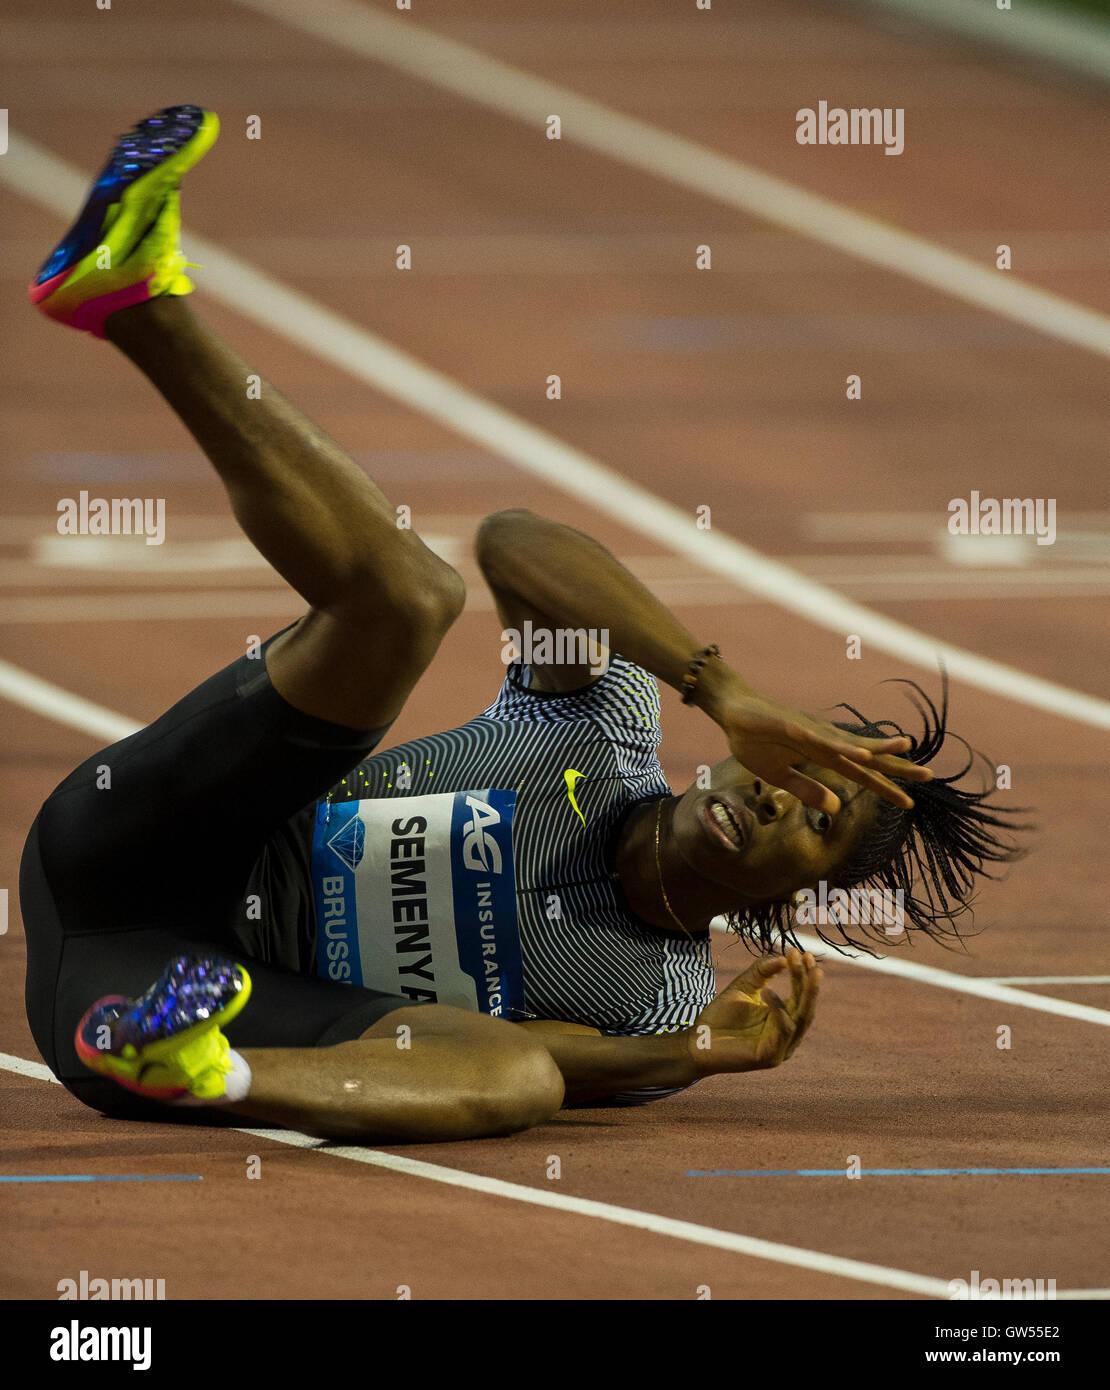 BRUSSELS, BELGIUM - SEPTEMBER 9: Caster Semenya competing in the Women's 400m at the AG Insurance Memorial Van - Stock Image